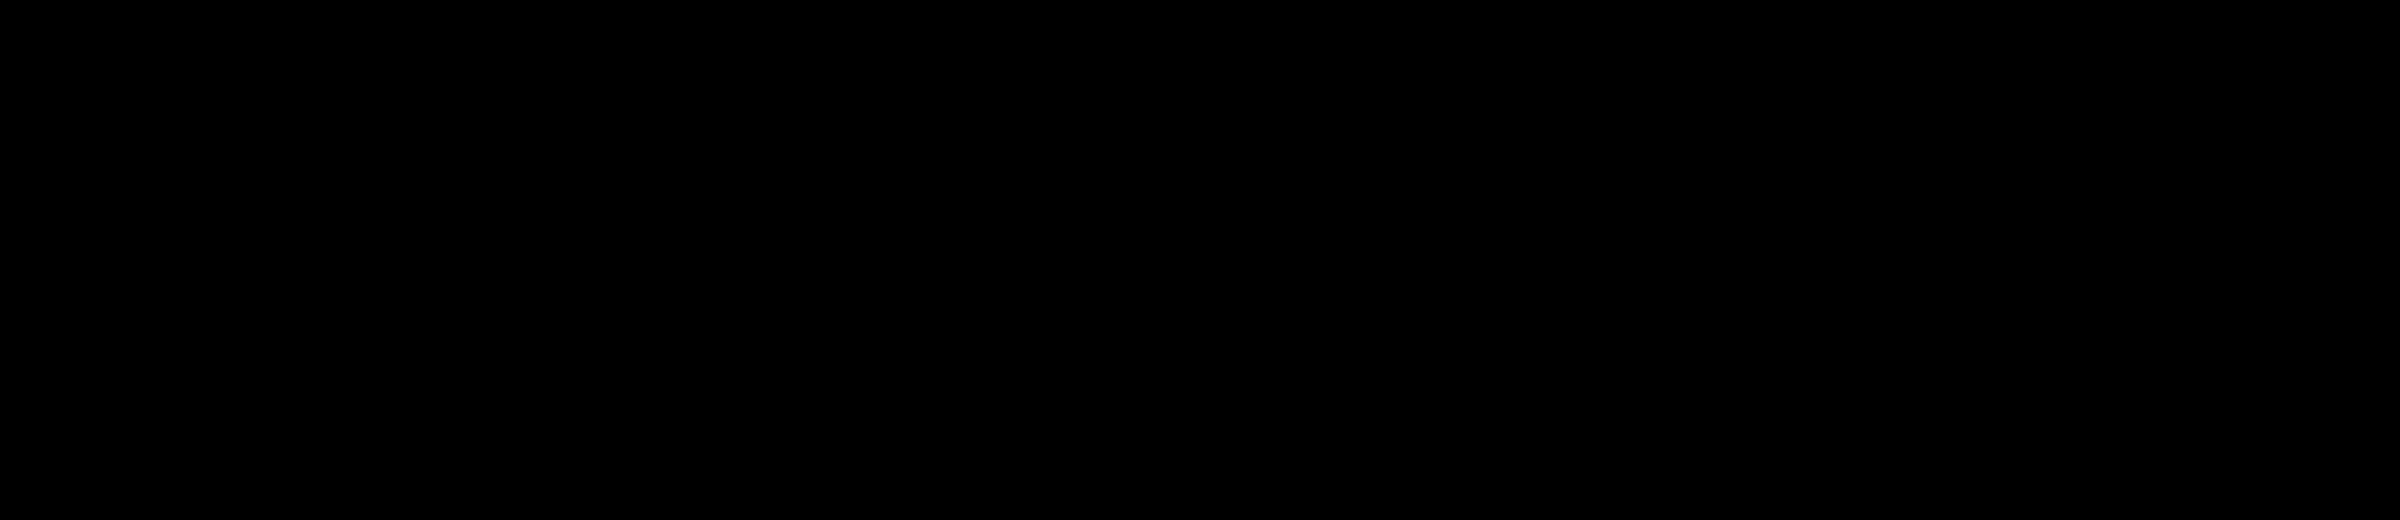 Clipart ruler blank. Big waves image png